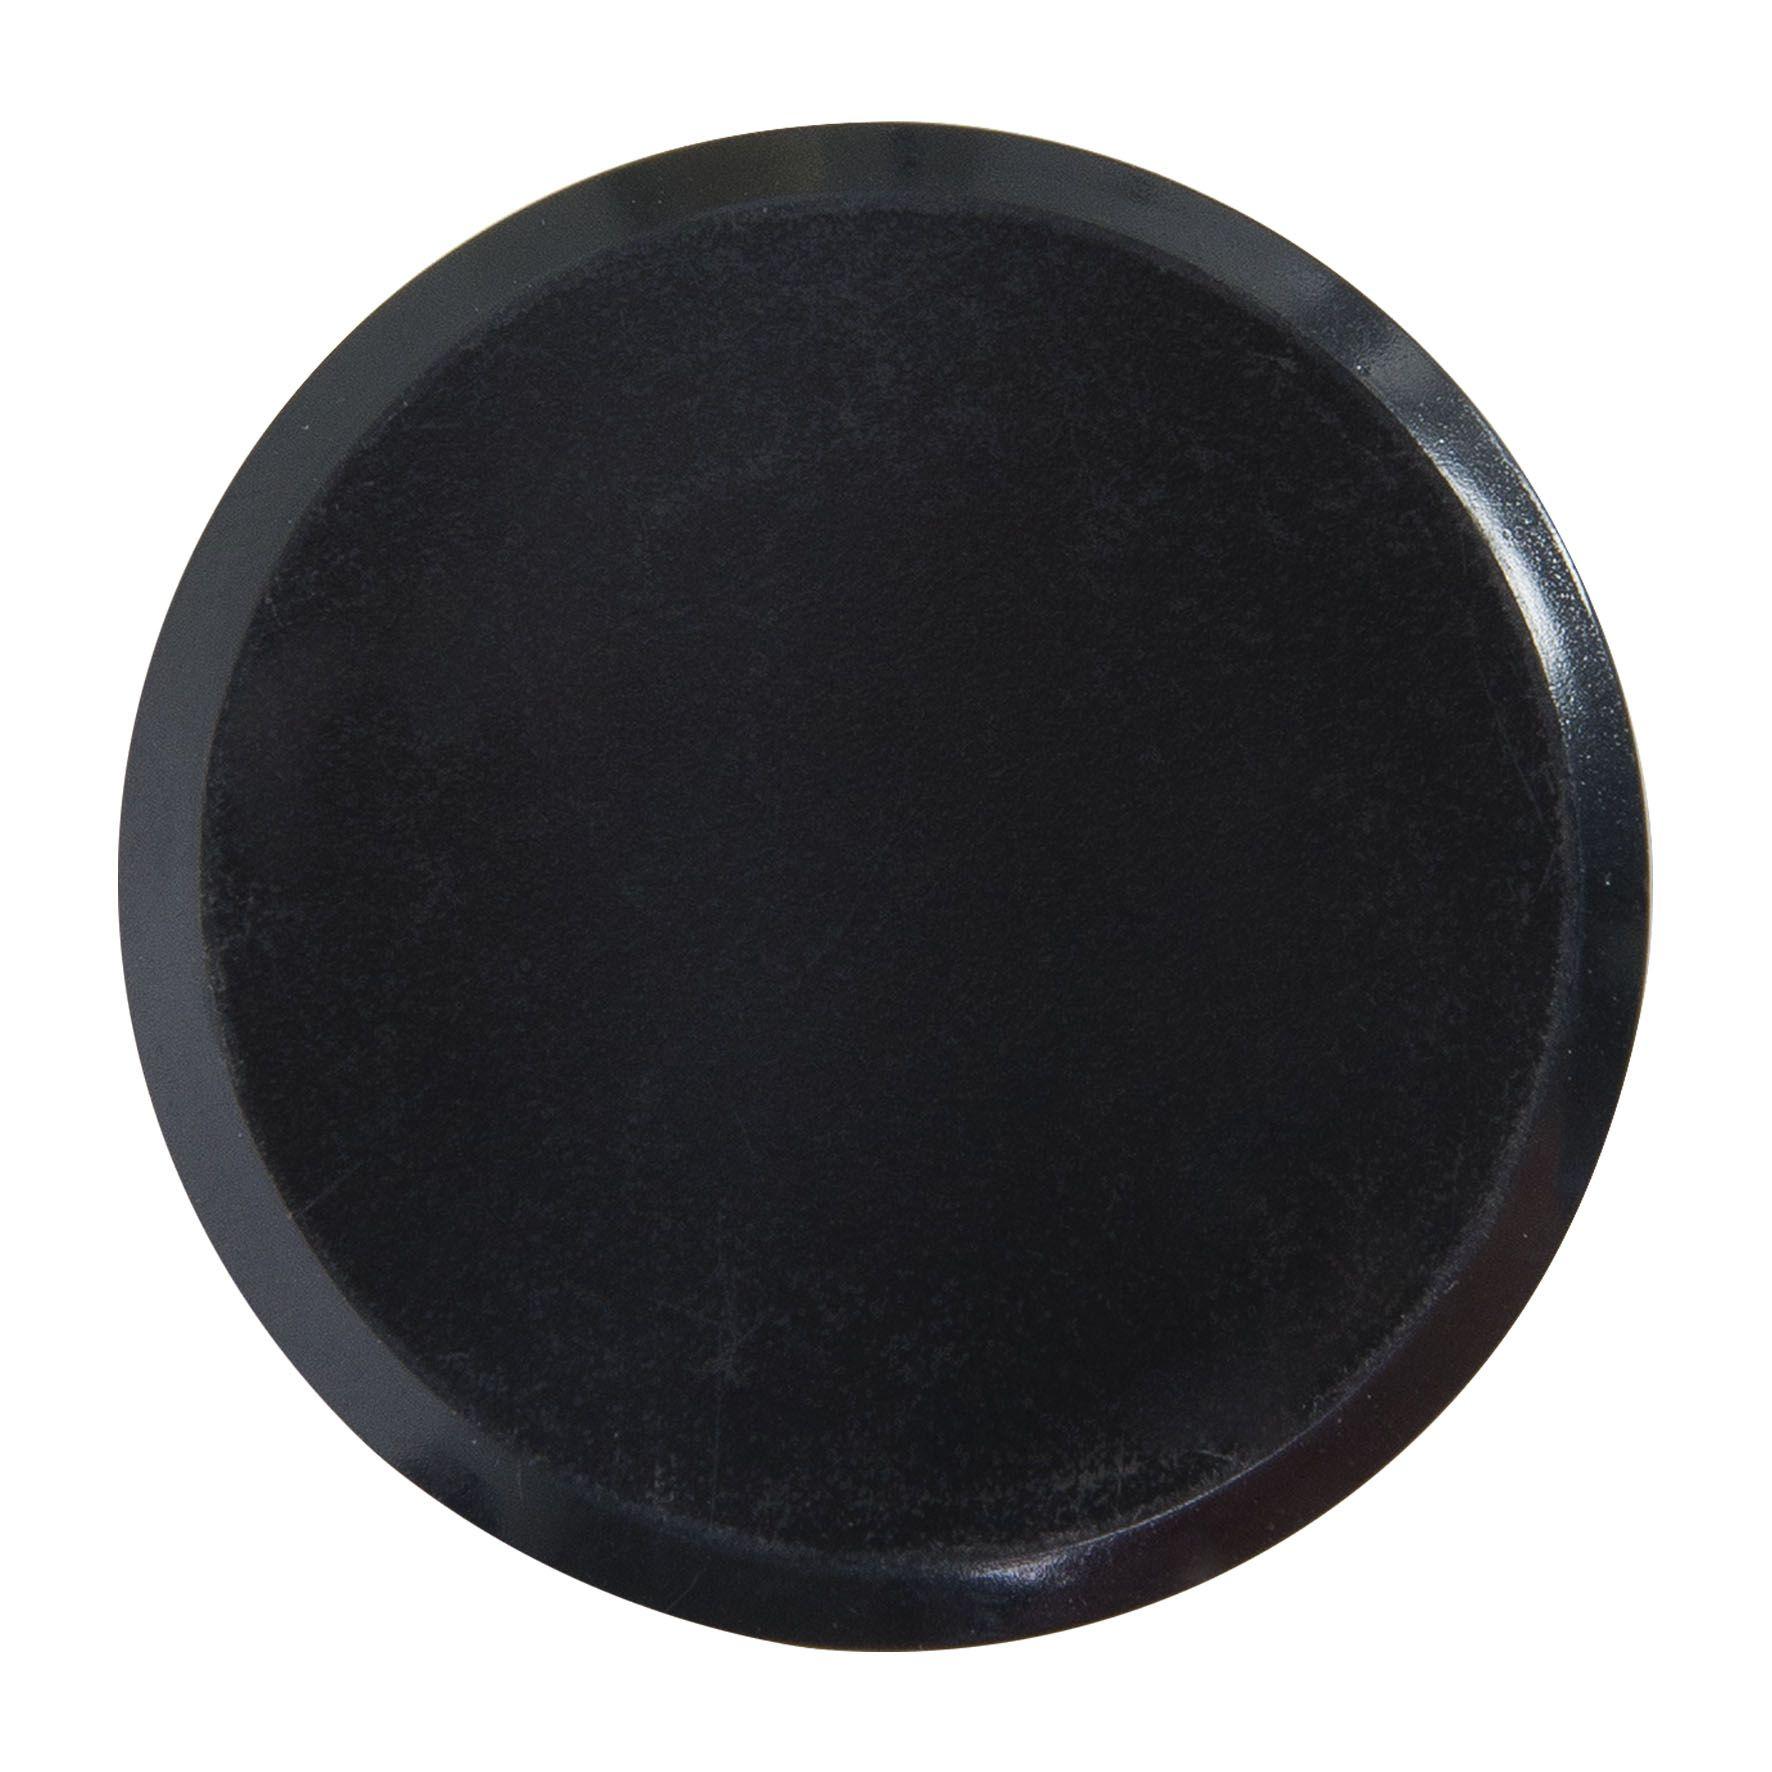 Goodies - Magnet publicitaire Ø 3cm - fond vert